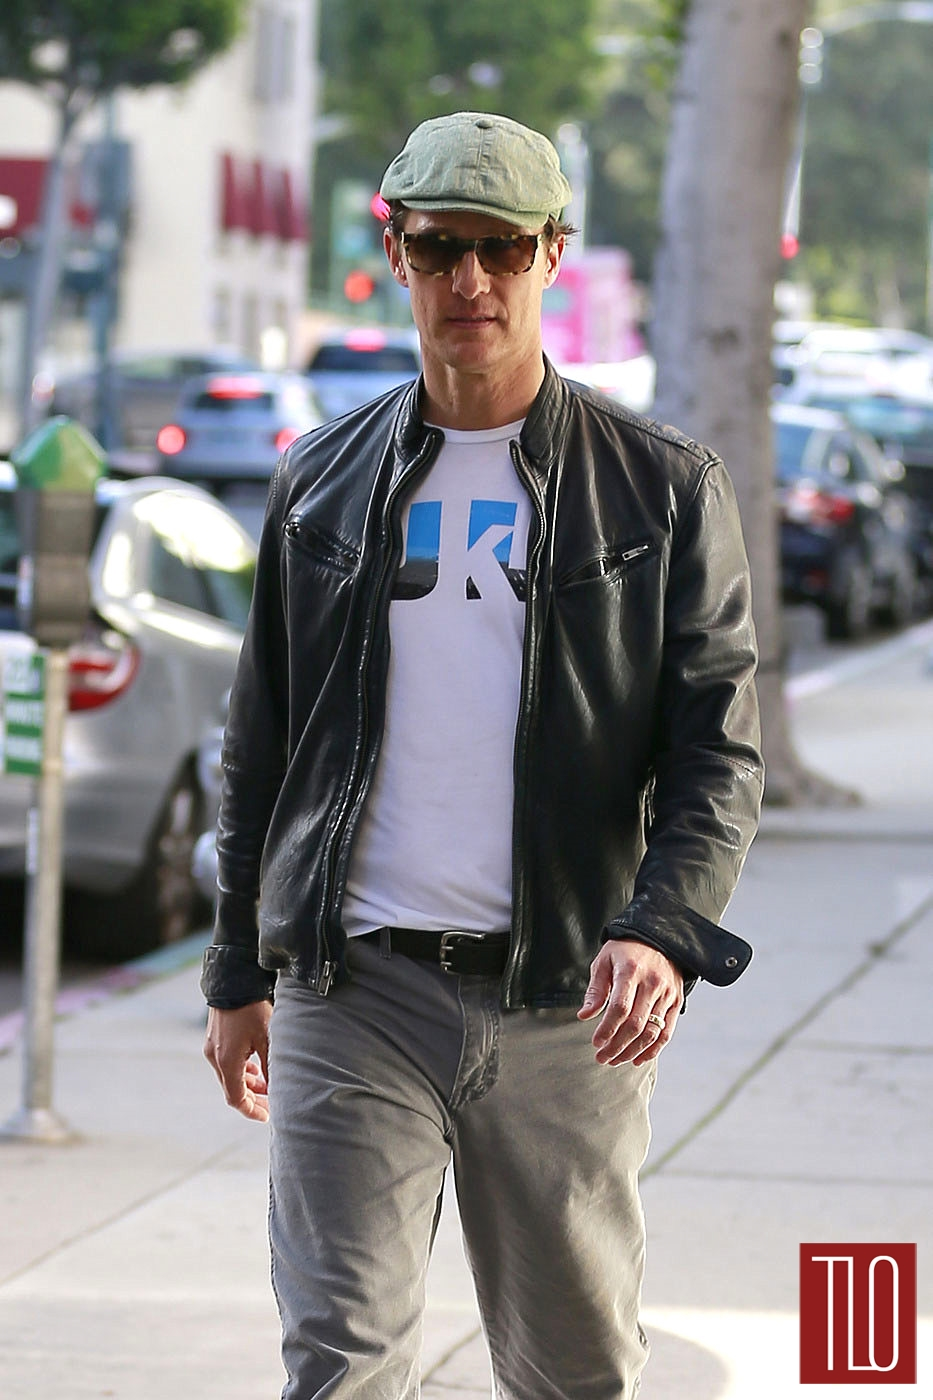 Matthew-McConaughey-GOTS-MBLA-Tom-Lorenzo-Site-TLO (1)